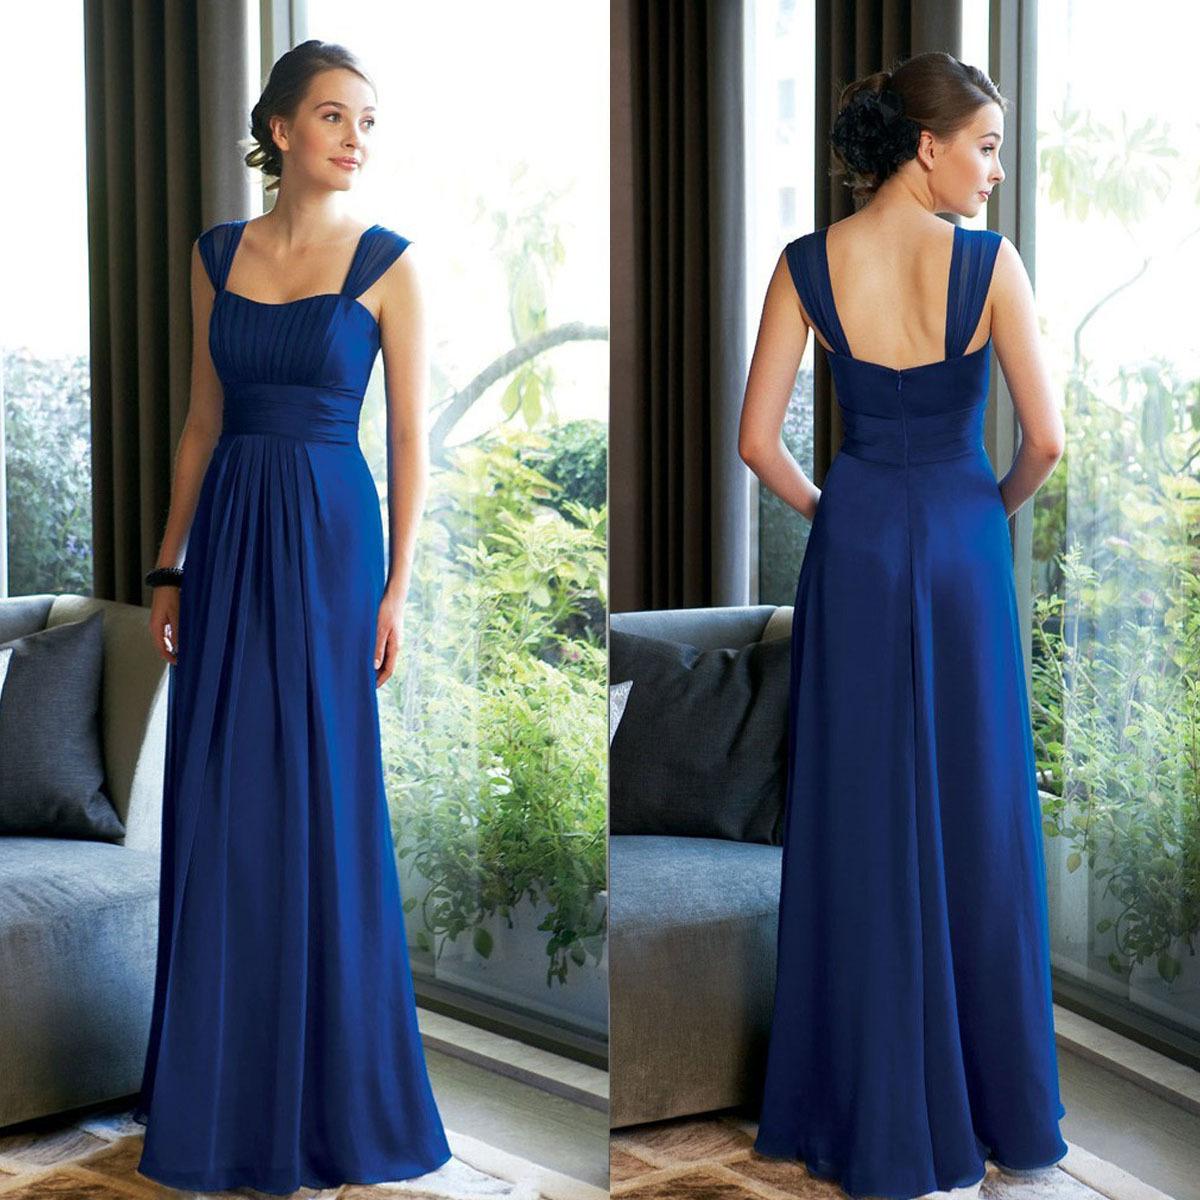 Cornflower Blue Bridesmaid Dresses